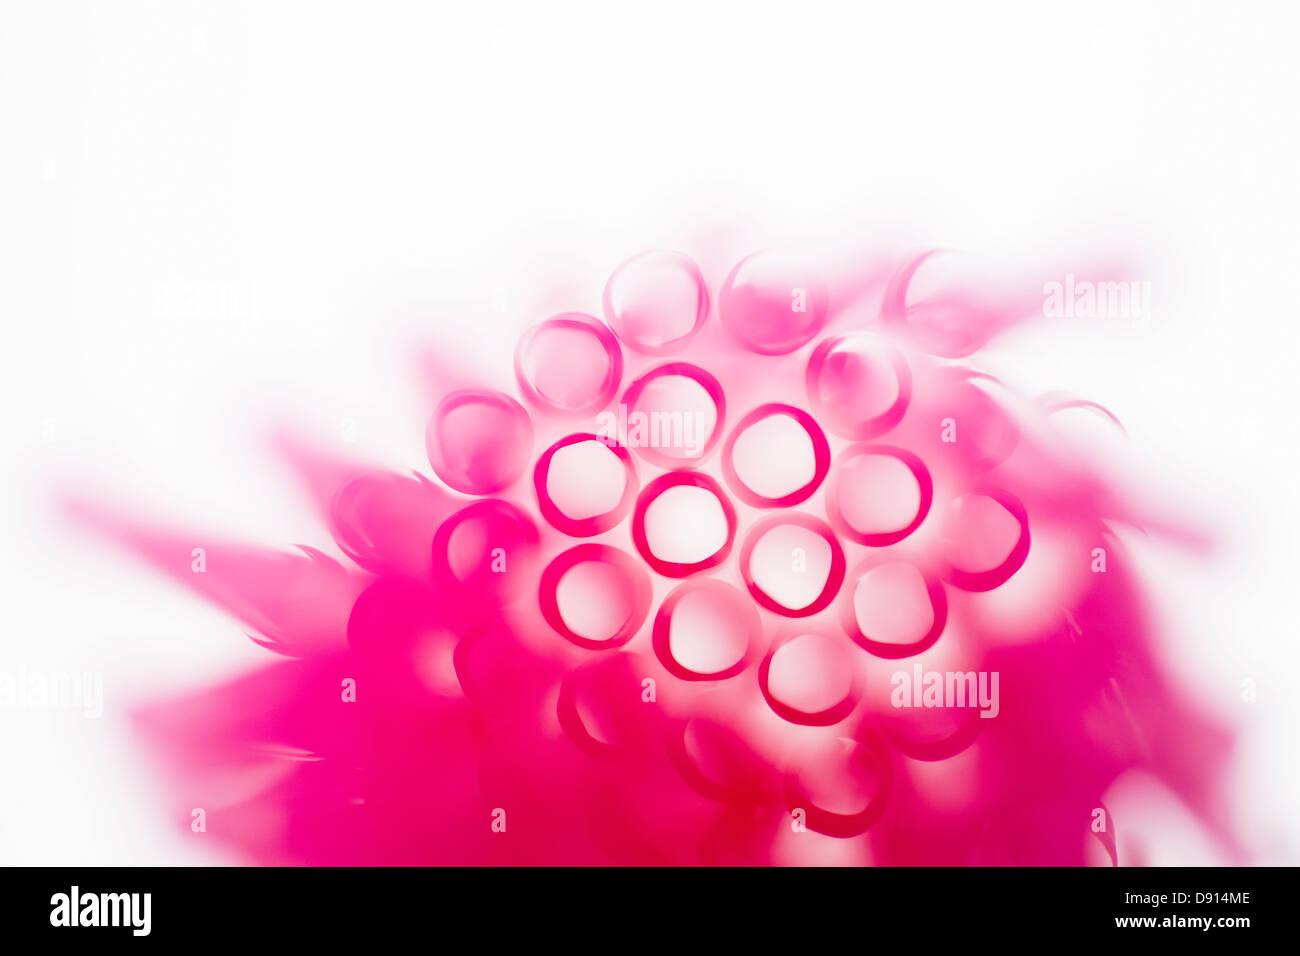 Foto de estudio de rosa pajas Foto de stock